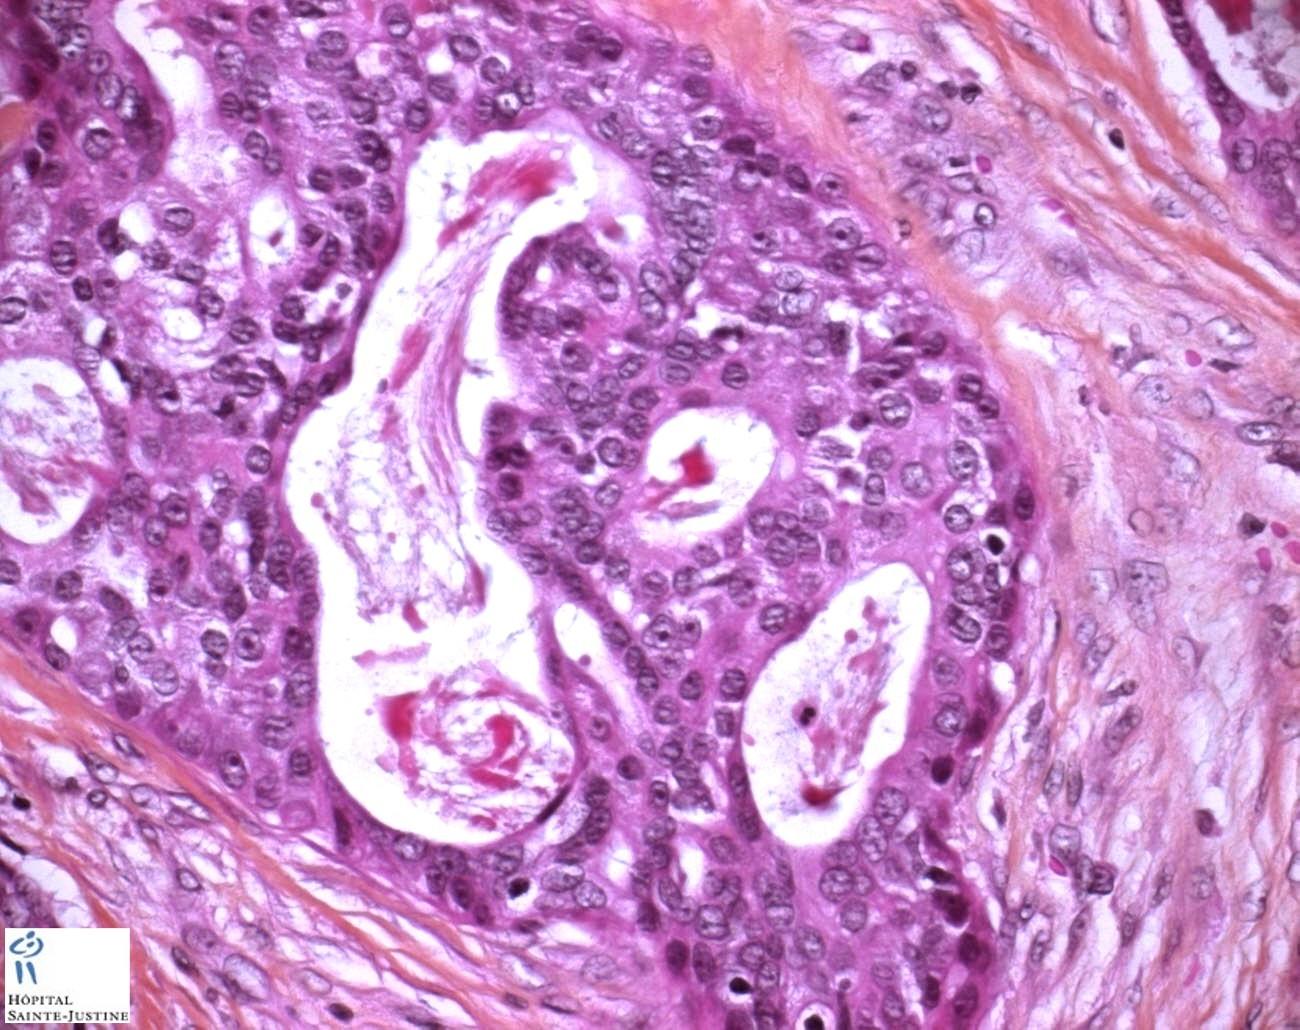 Gland Cell Parotid Salivary